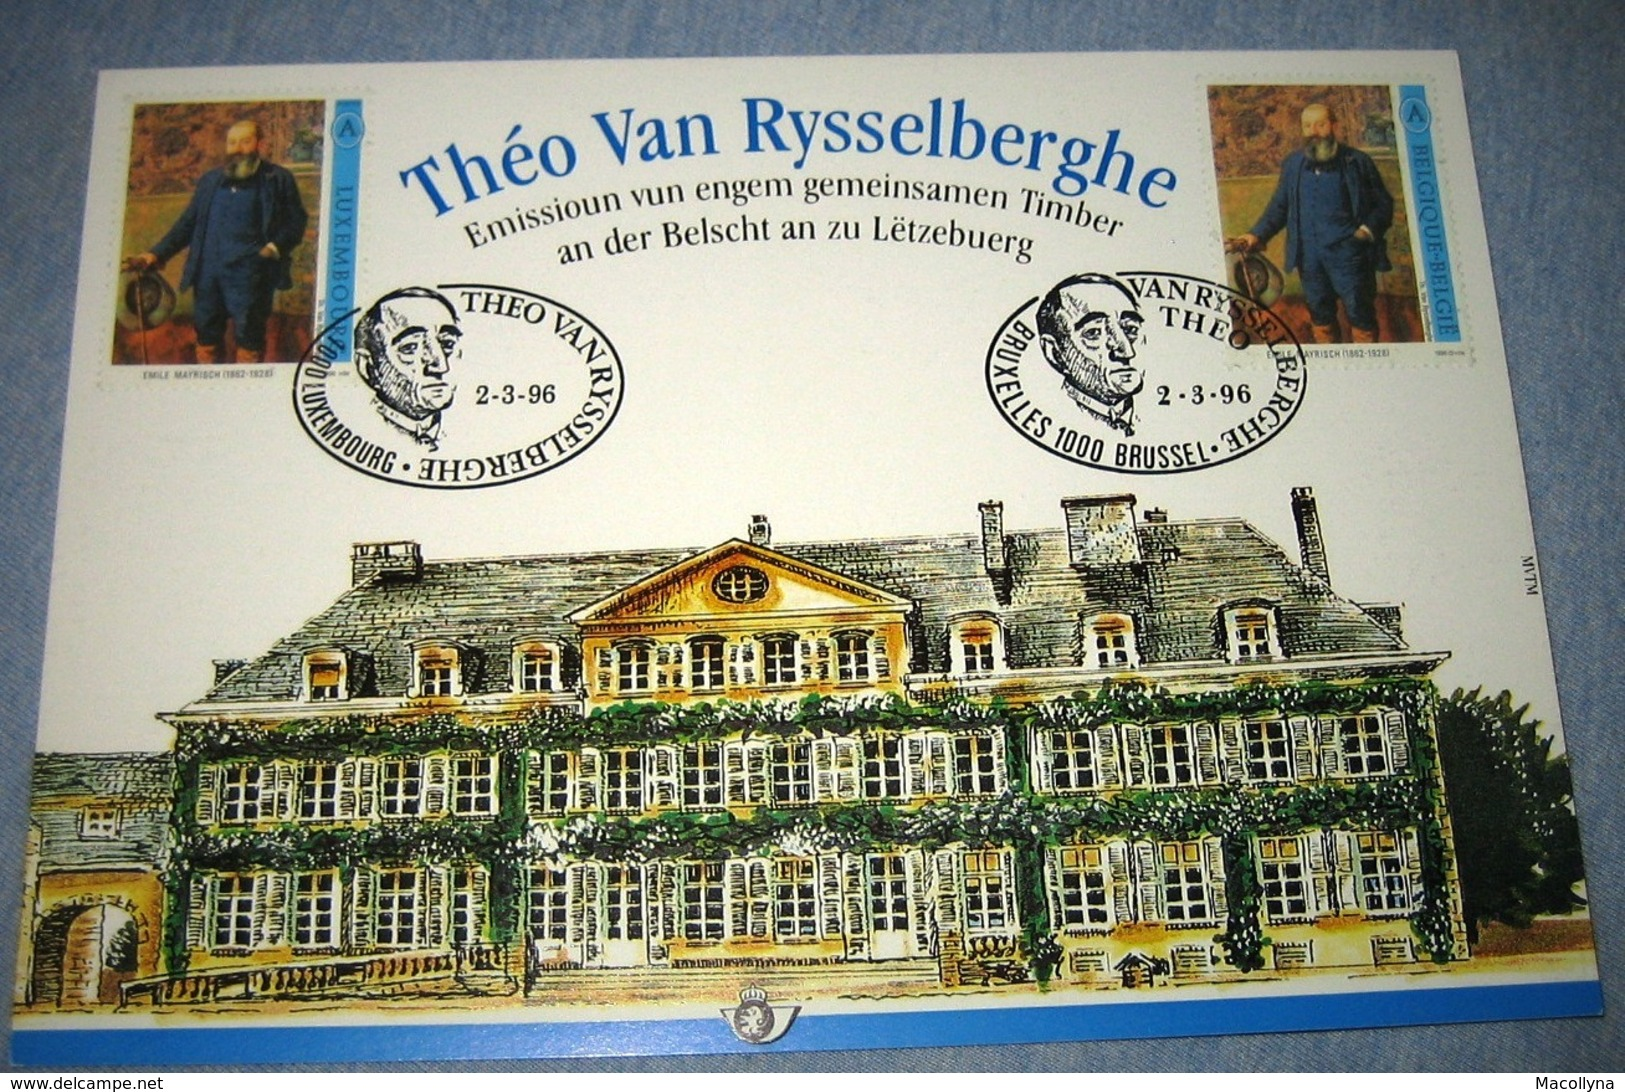 Herdenkingskaart - Carte-souvenir Rysselberghe 2627(o) Cote 8,5€ België 1995 - Souvenir Cards